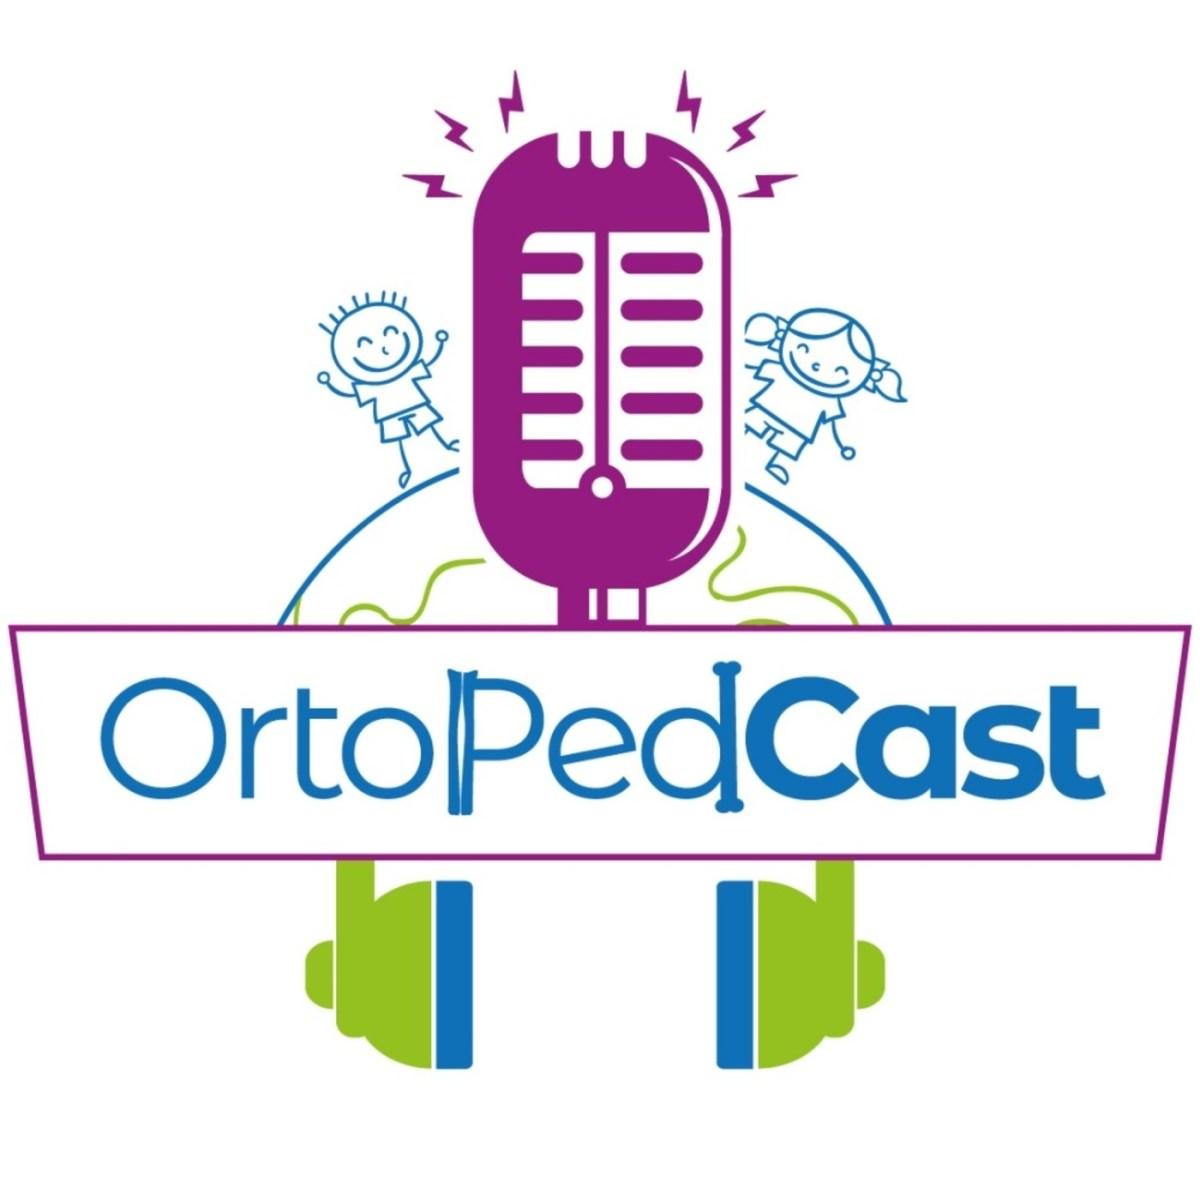 OrtoPedCast